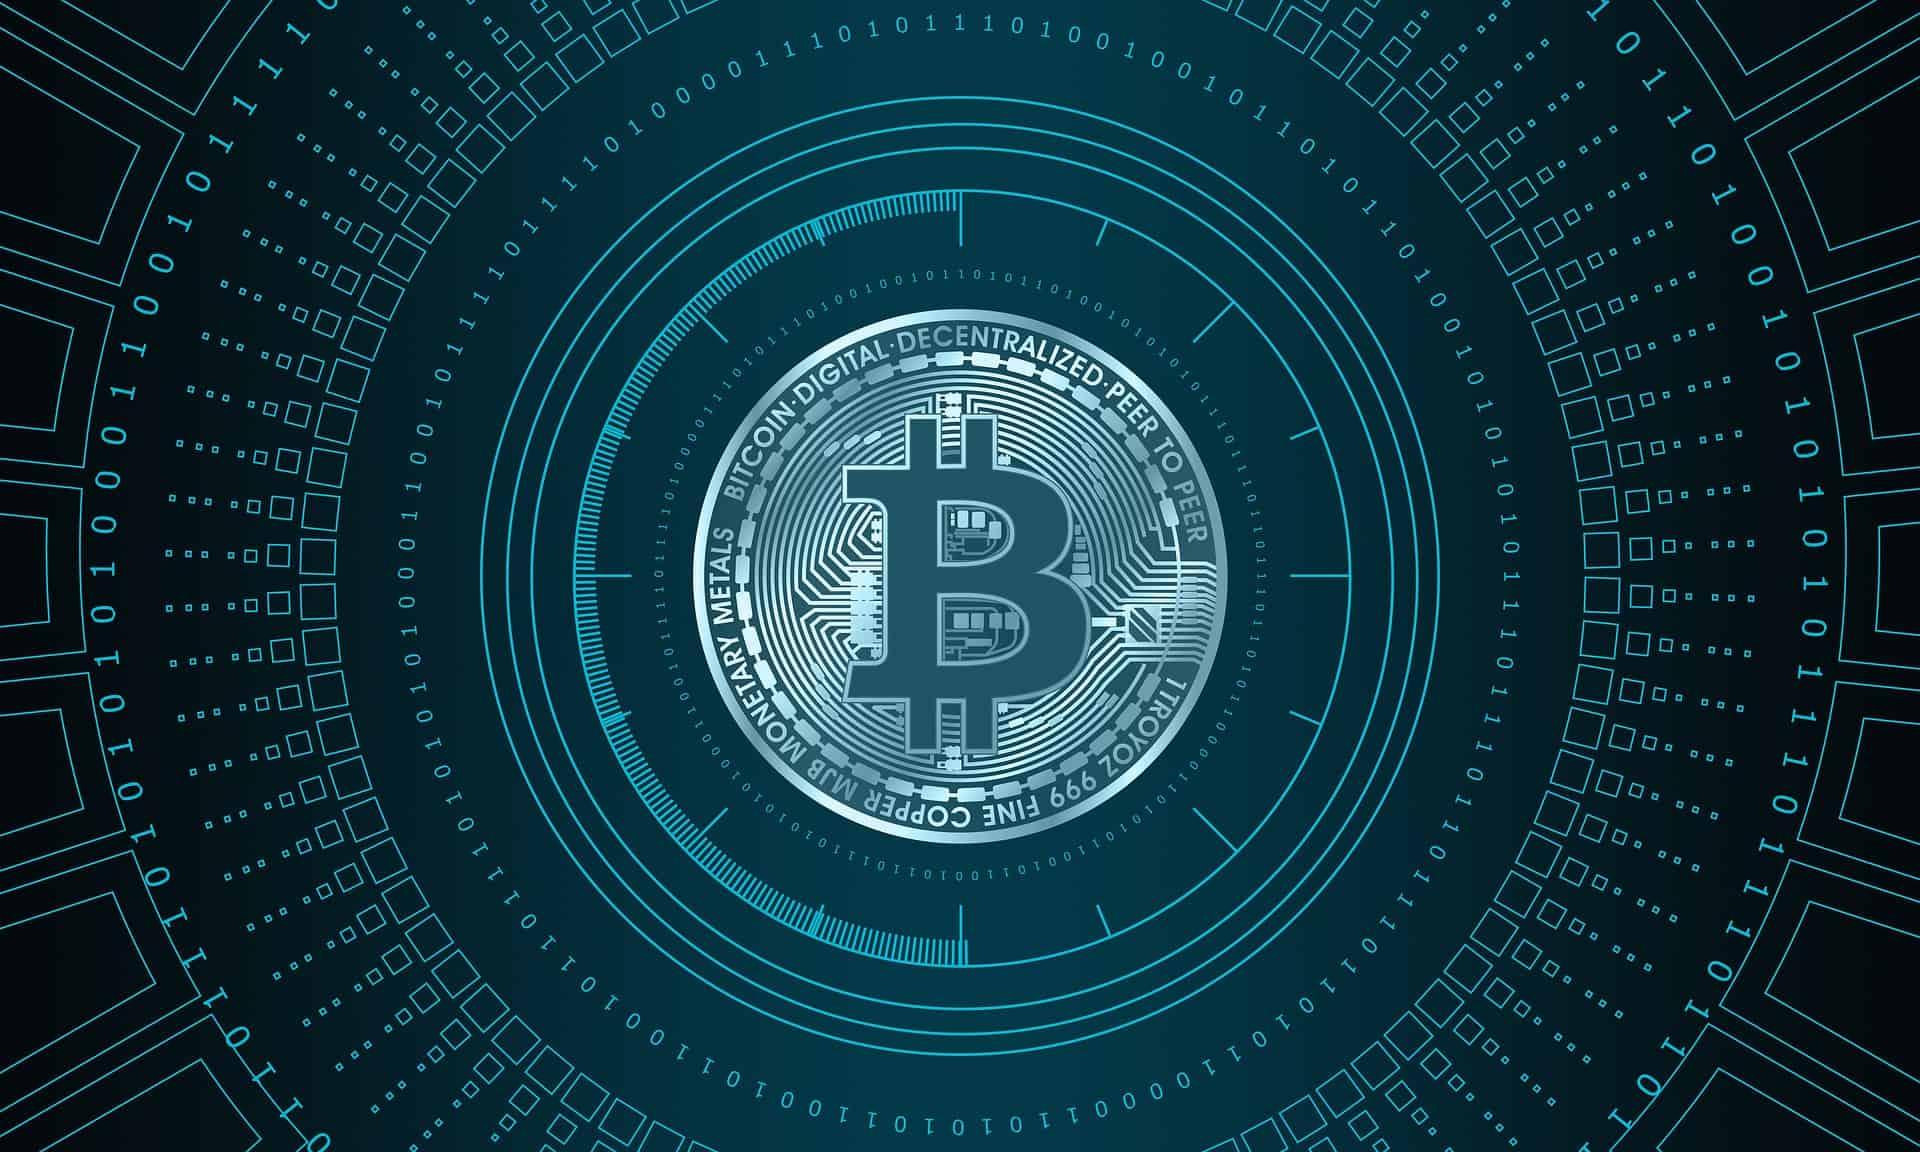 BTIG Goes Ultra Bullish ON Bitcoin, Targets $50,000 for 2021